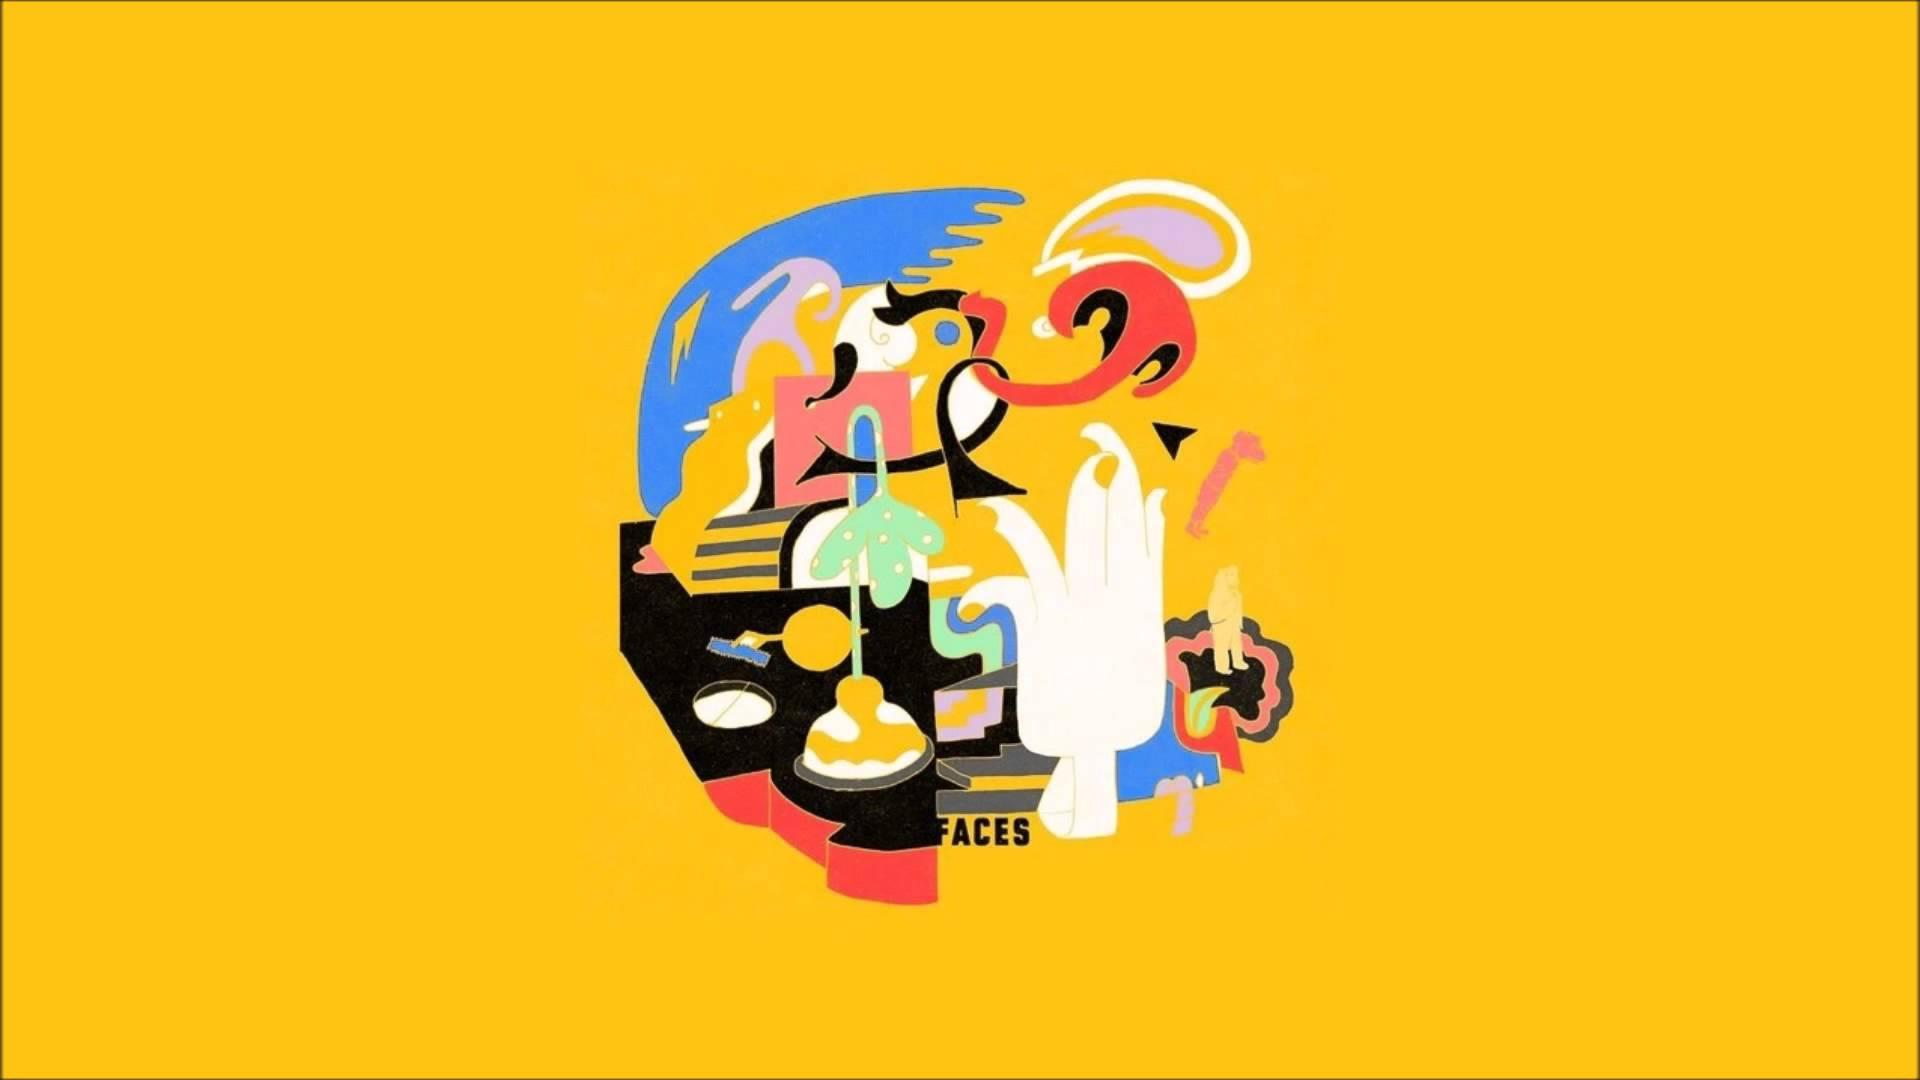 Mac Miller Faces Wallpapers - Top Free Mac Miller Faces